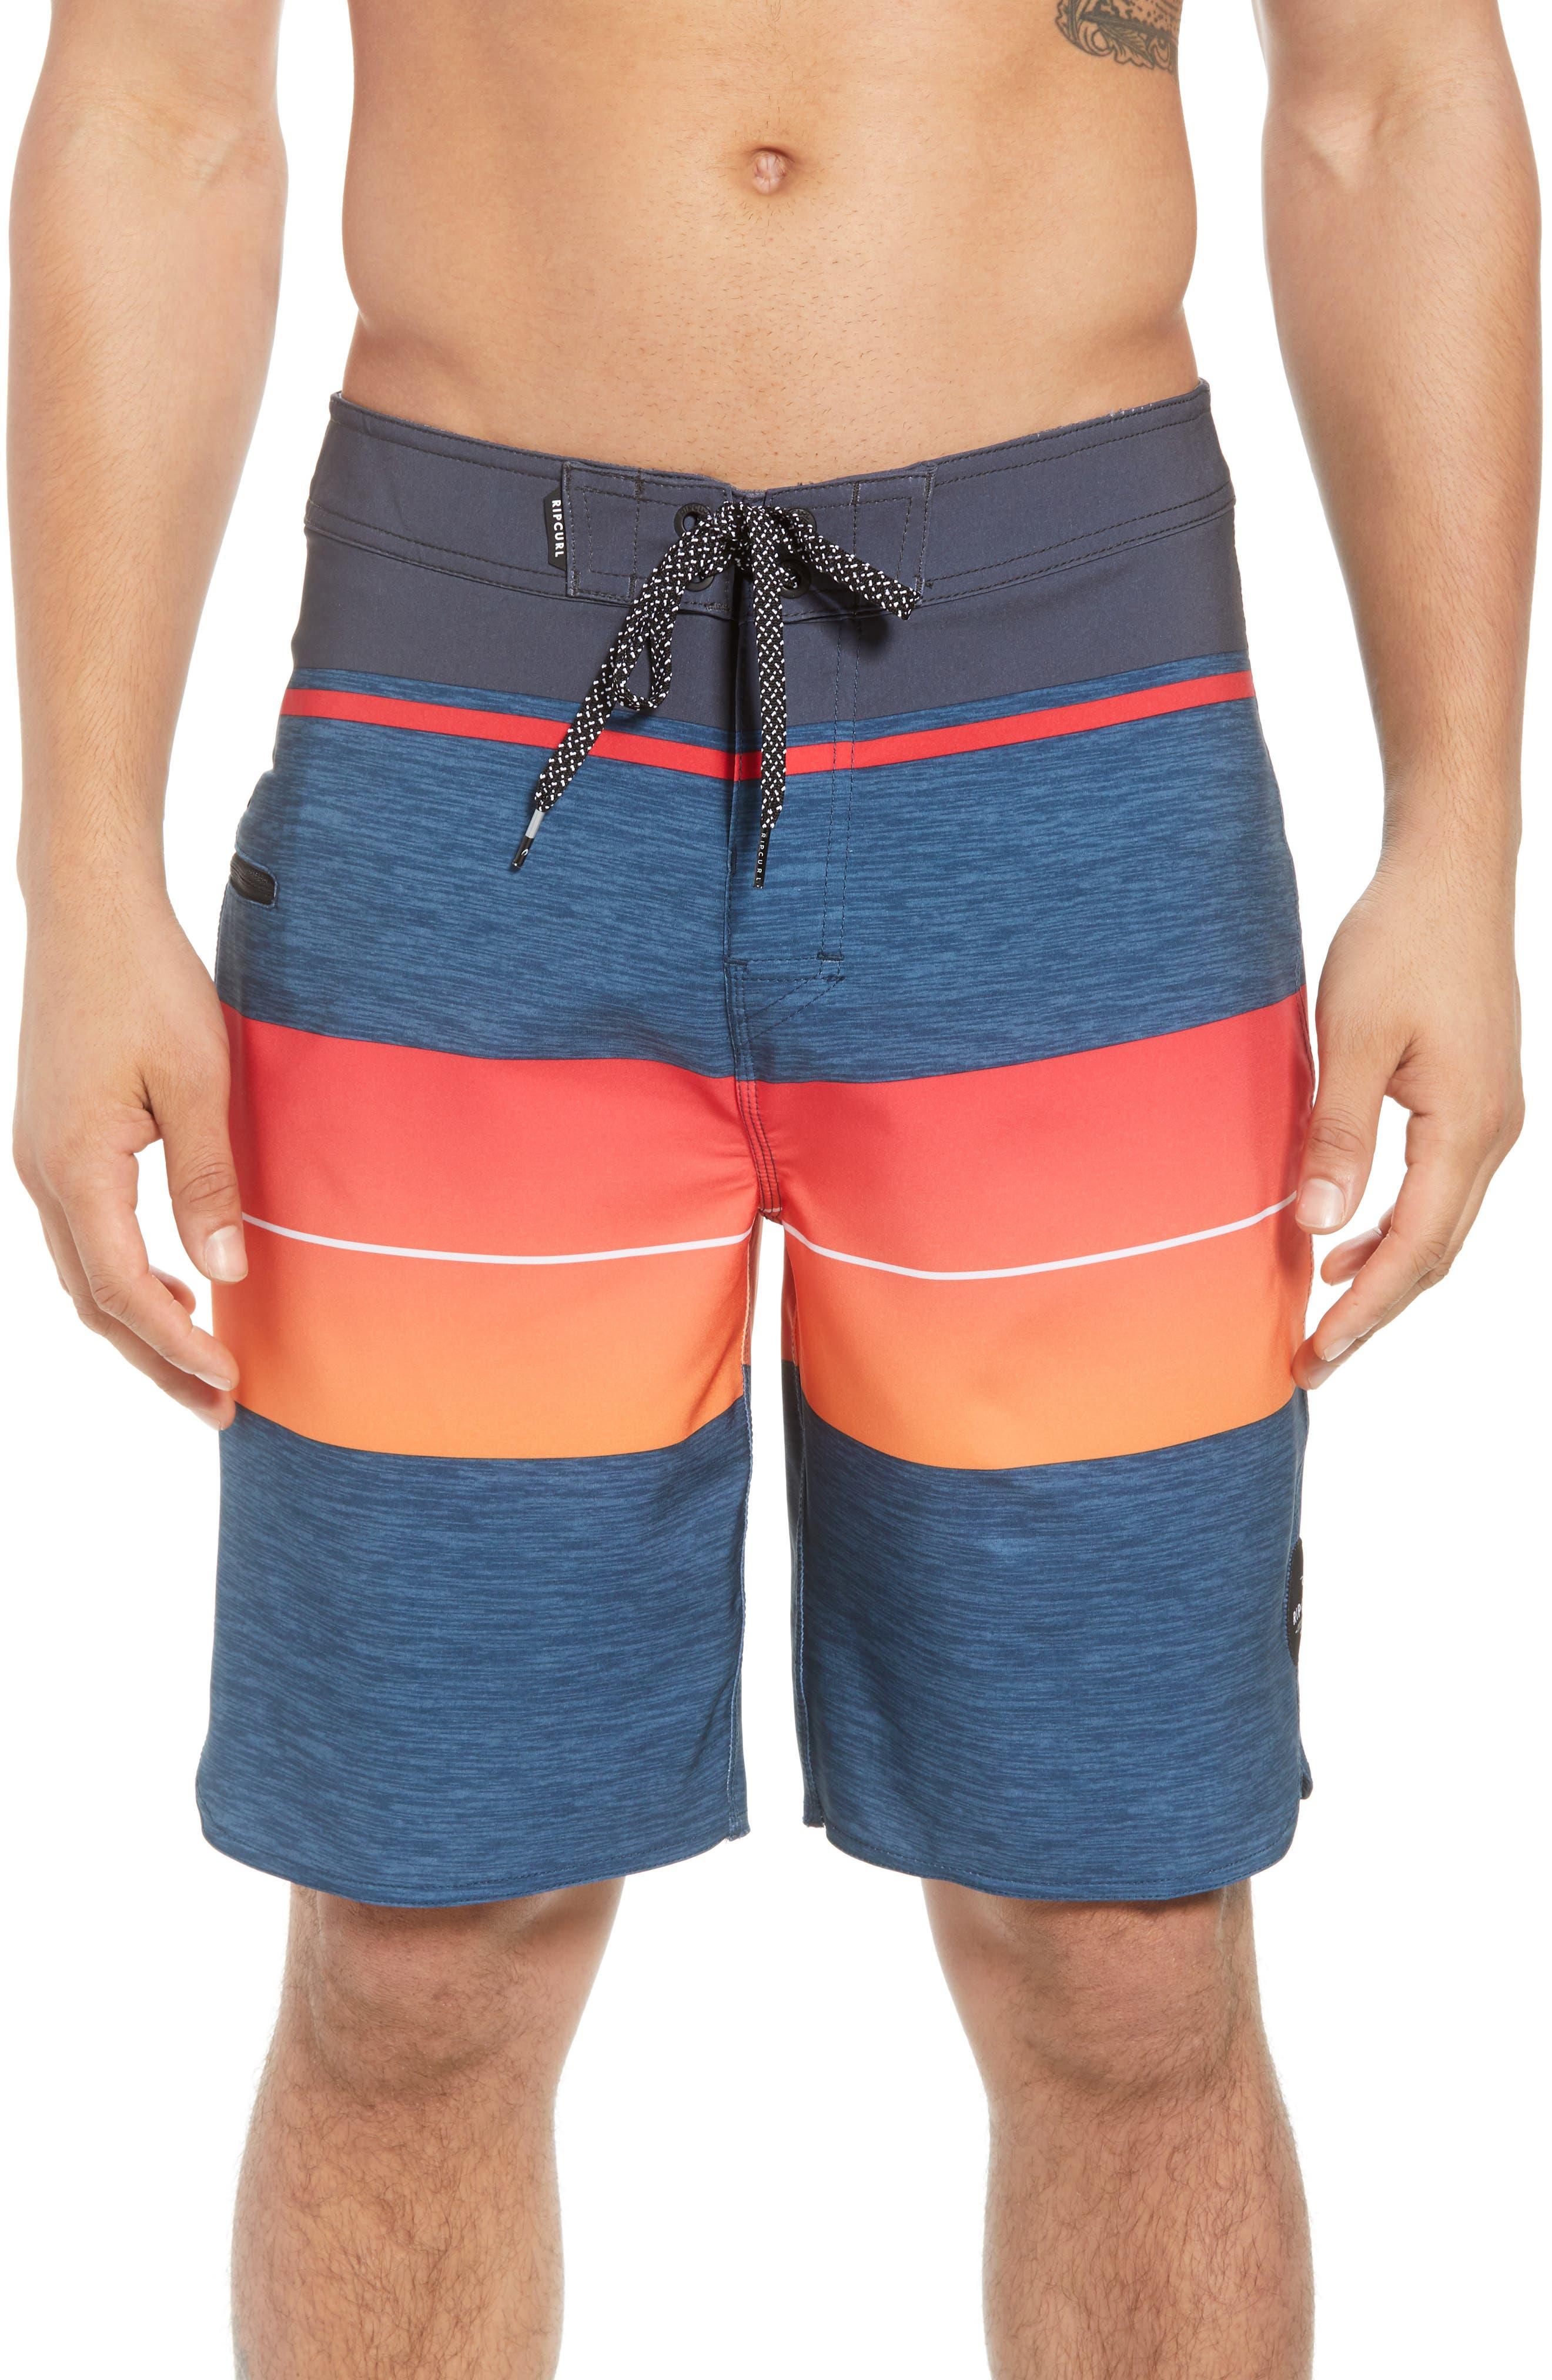 Mirage Eclipse Board Shorts,                             Main thumbnail 2, color,